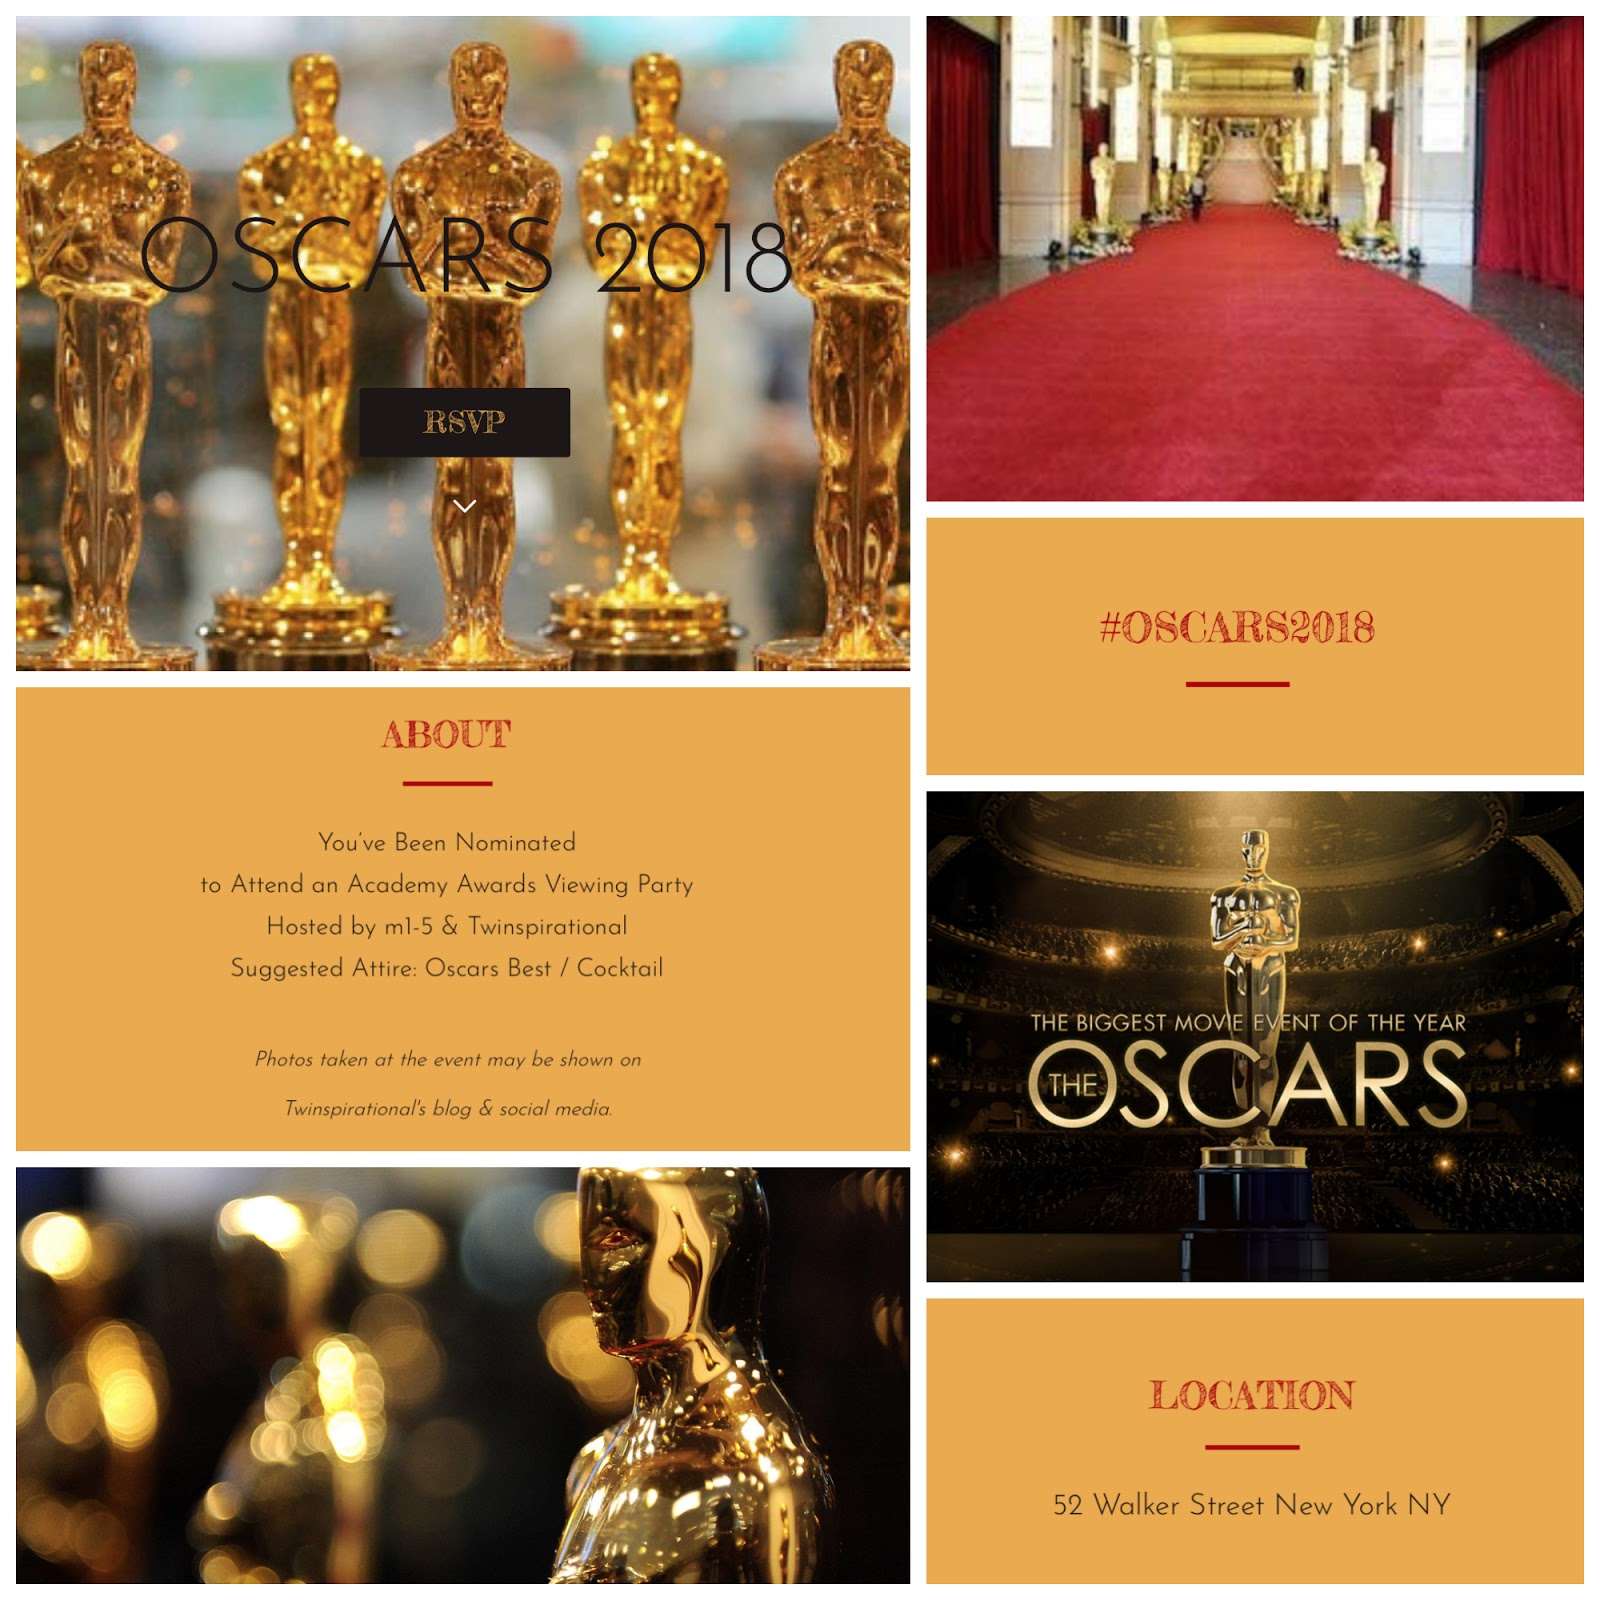 Oscars%2BInvitation